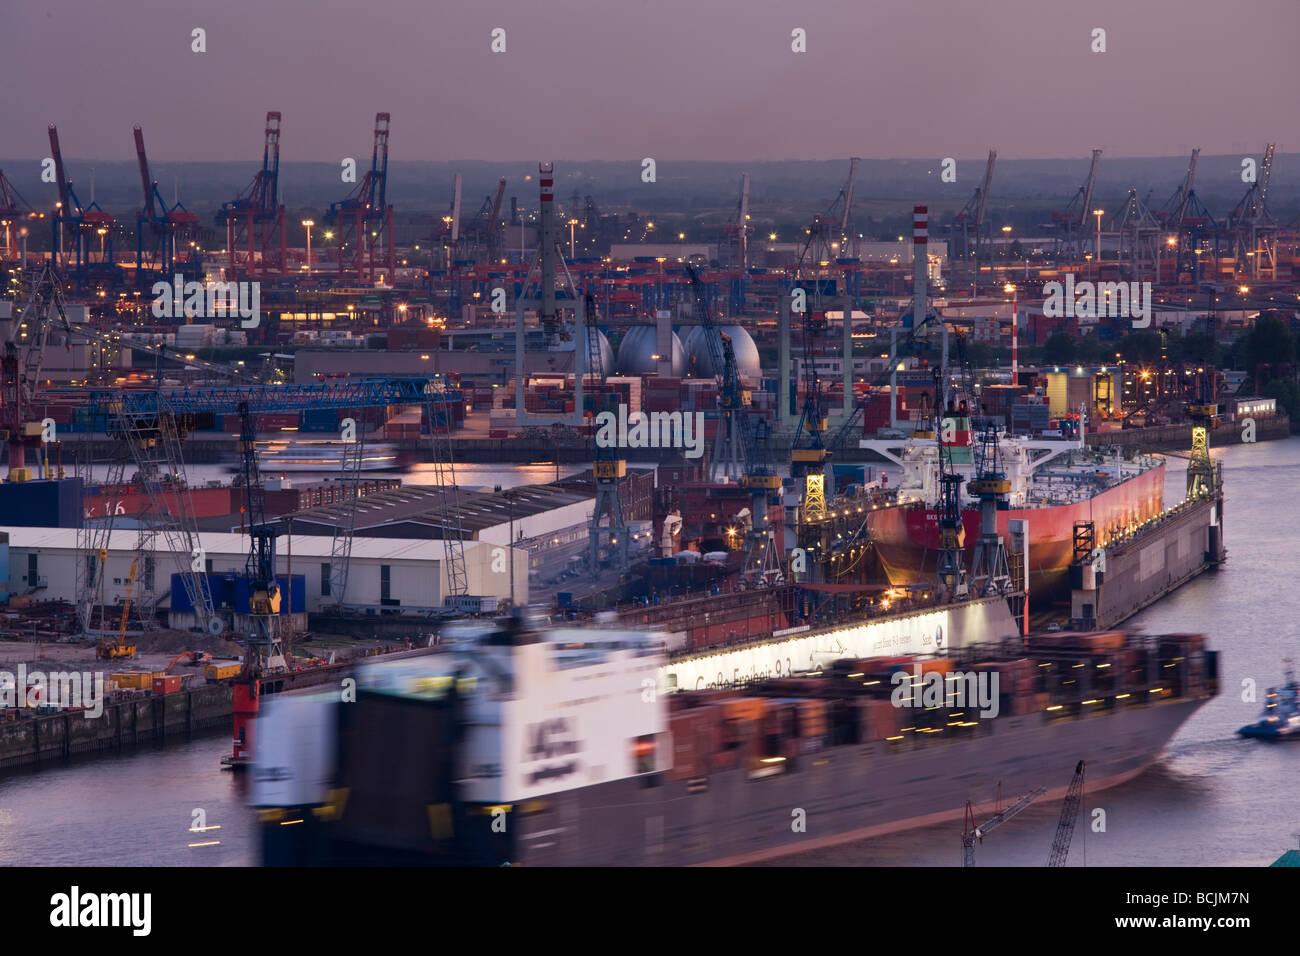 Germany, State of Hamburg, Hamburg, Elbe River and shipyard traffic - Stock Image